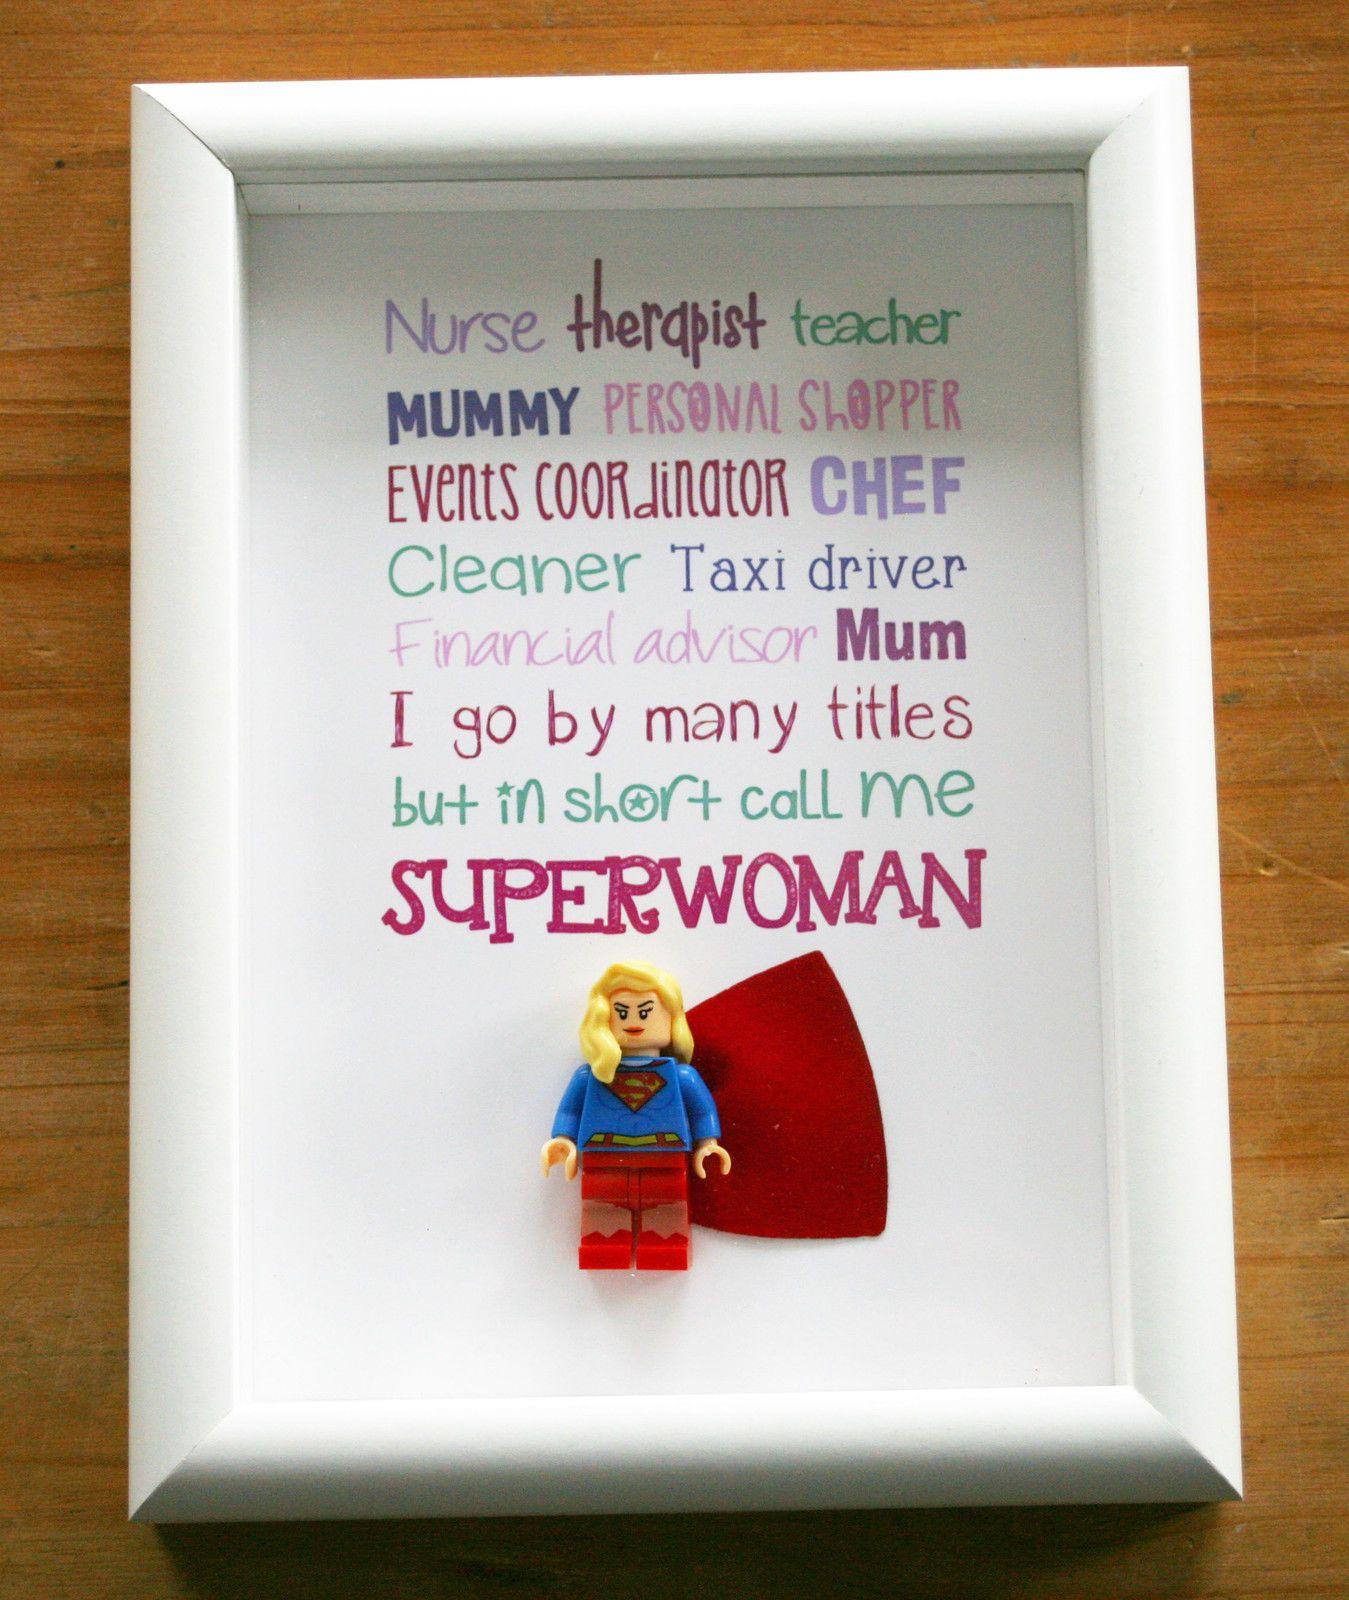 Birthday present mum sister job descriptions of a mother superwoman ...